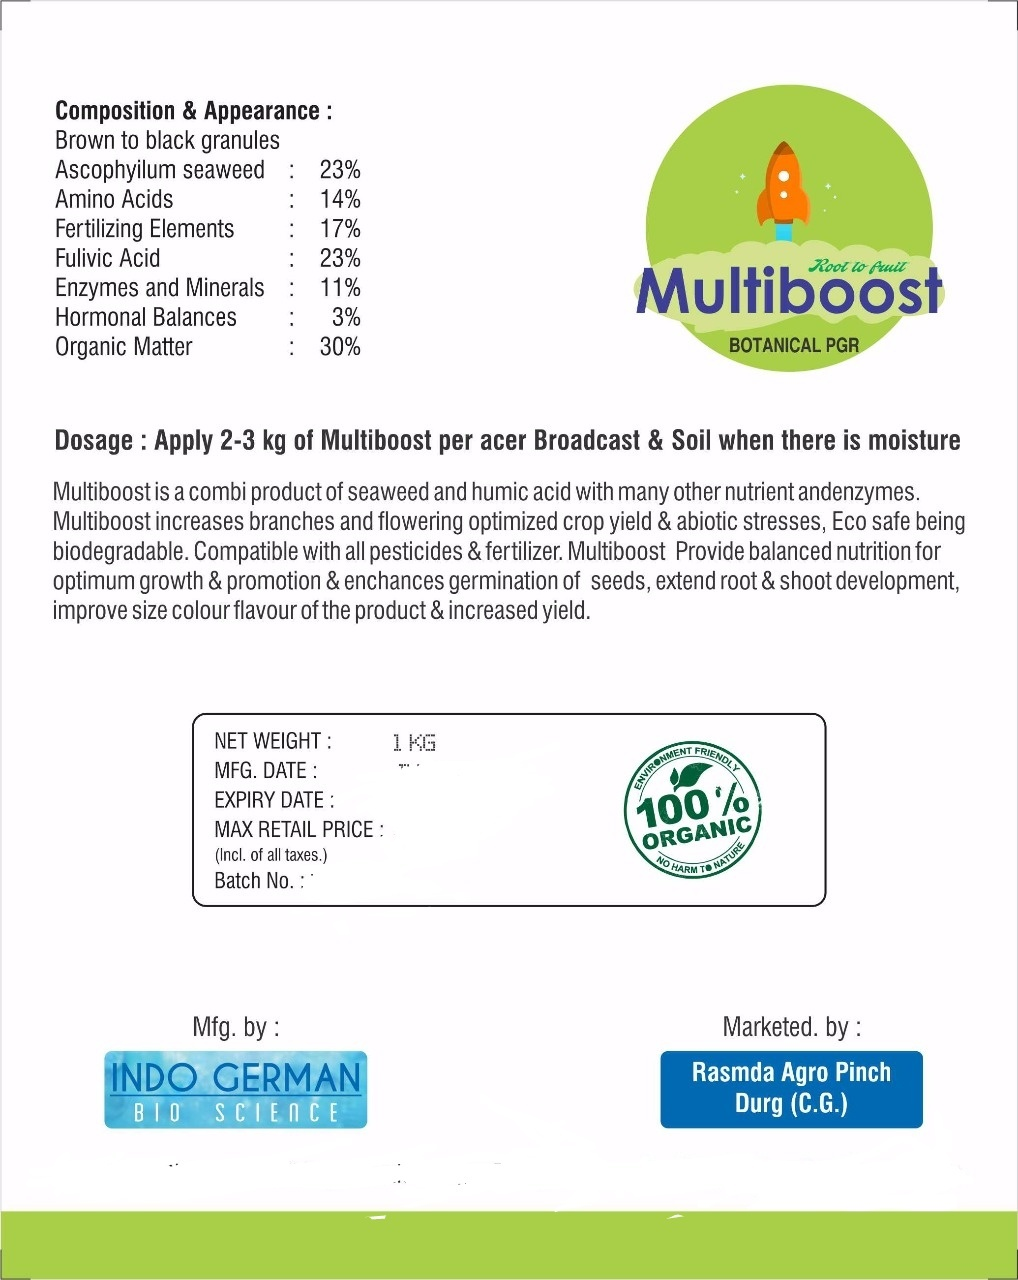 Multiboost Botanical PGR